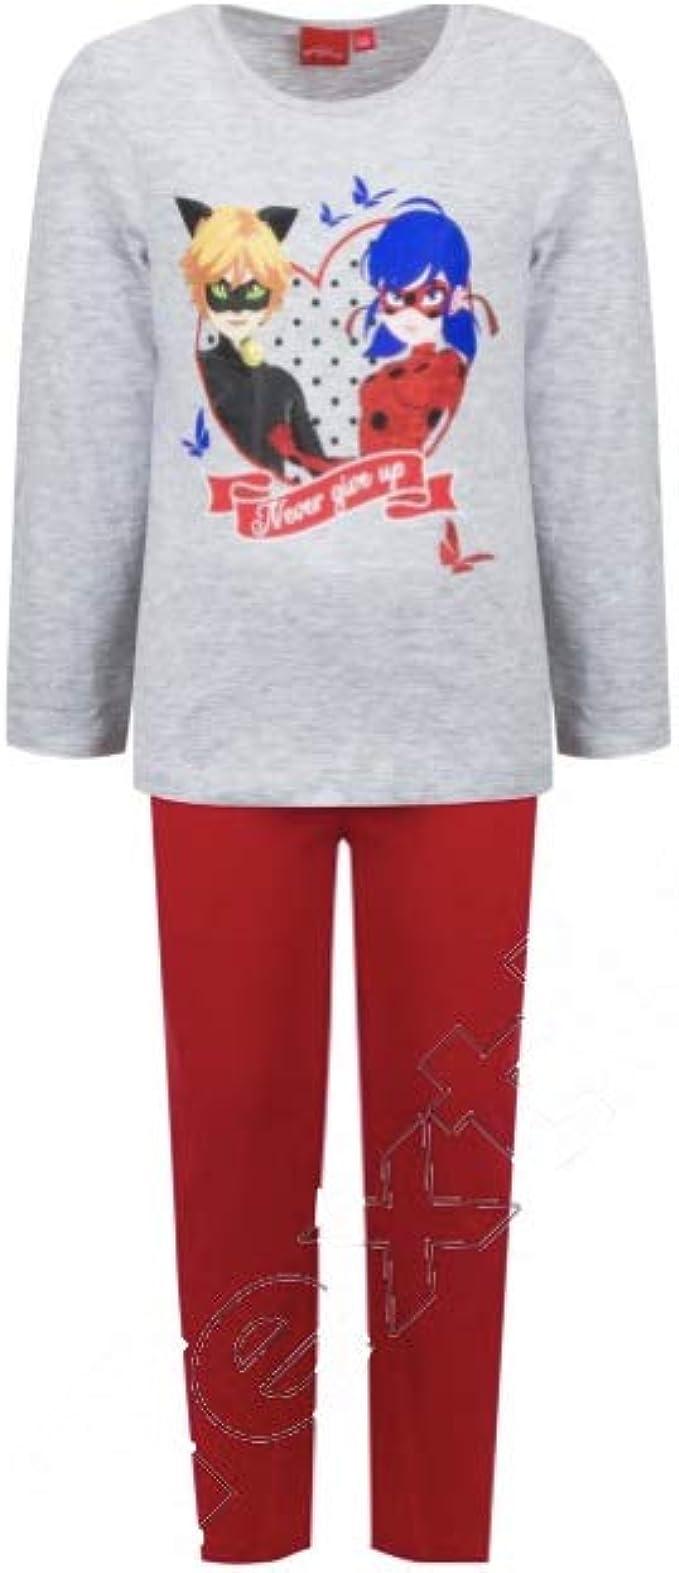 Miraculous Ladybug Pijama.